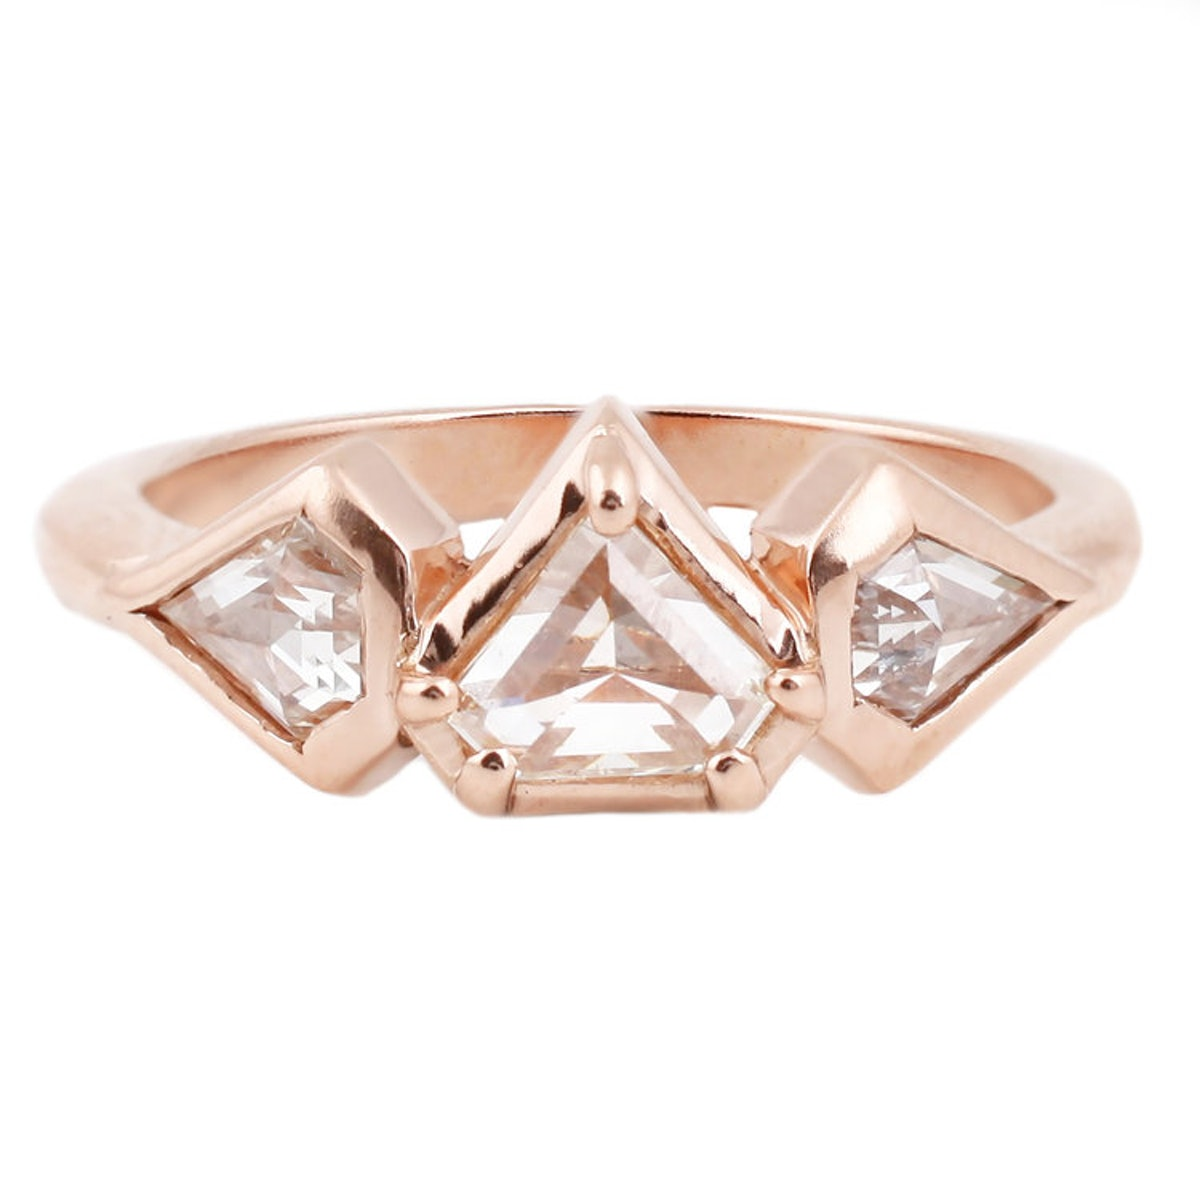 Rose Gold Demi Prism Ring